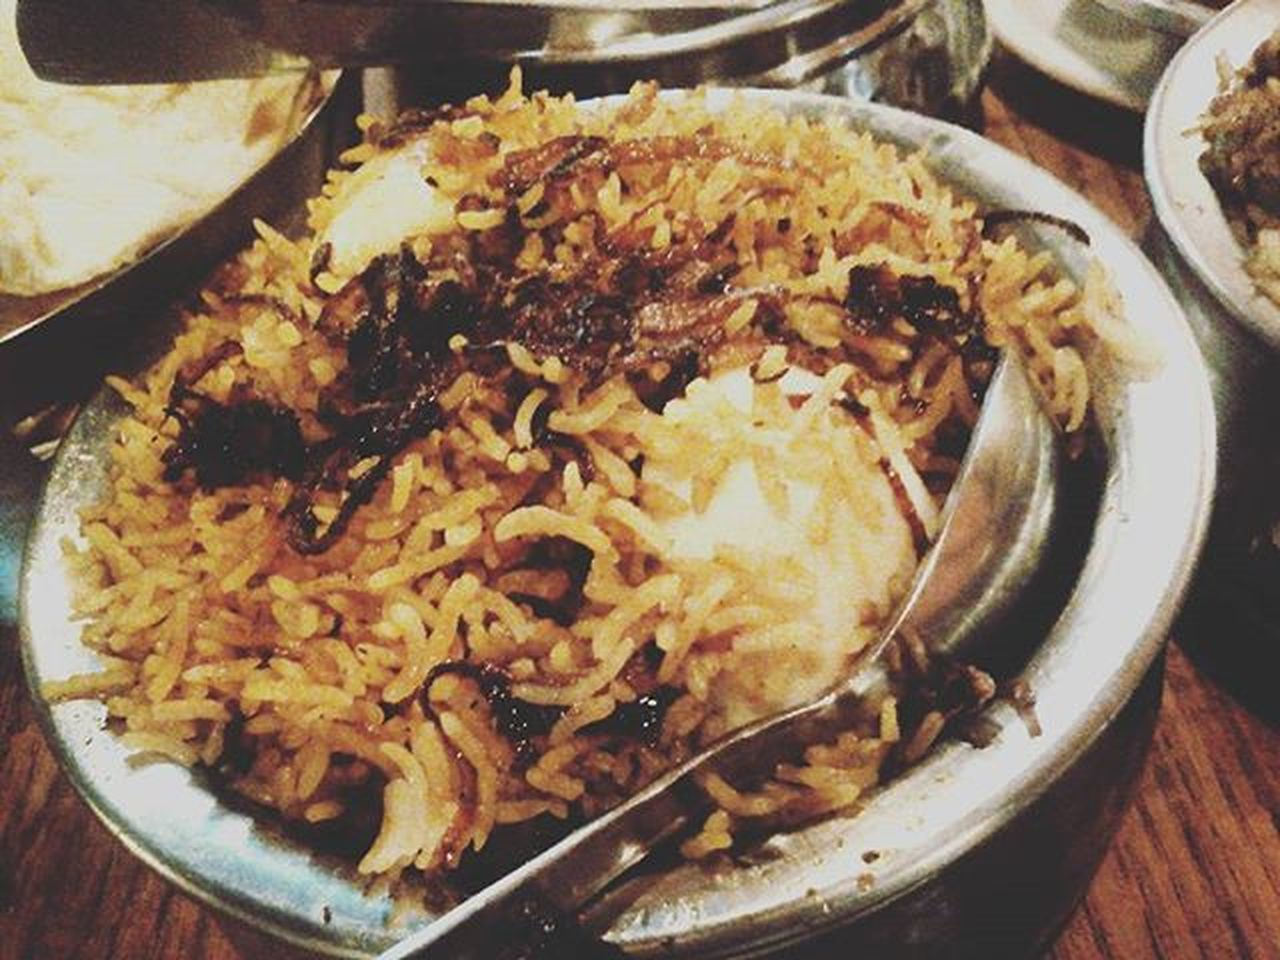 Chickendumbiriyani Slicedegg Friedonions Wellcooked Tenderjuicychickenpieces WorthEveryPenny Foodstagram Foodie Foodgasm Foodporn Foodblog Redbox